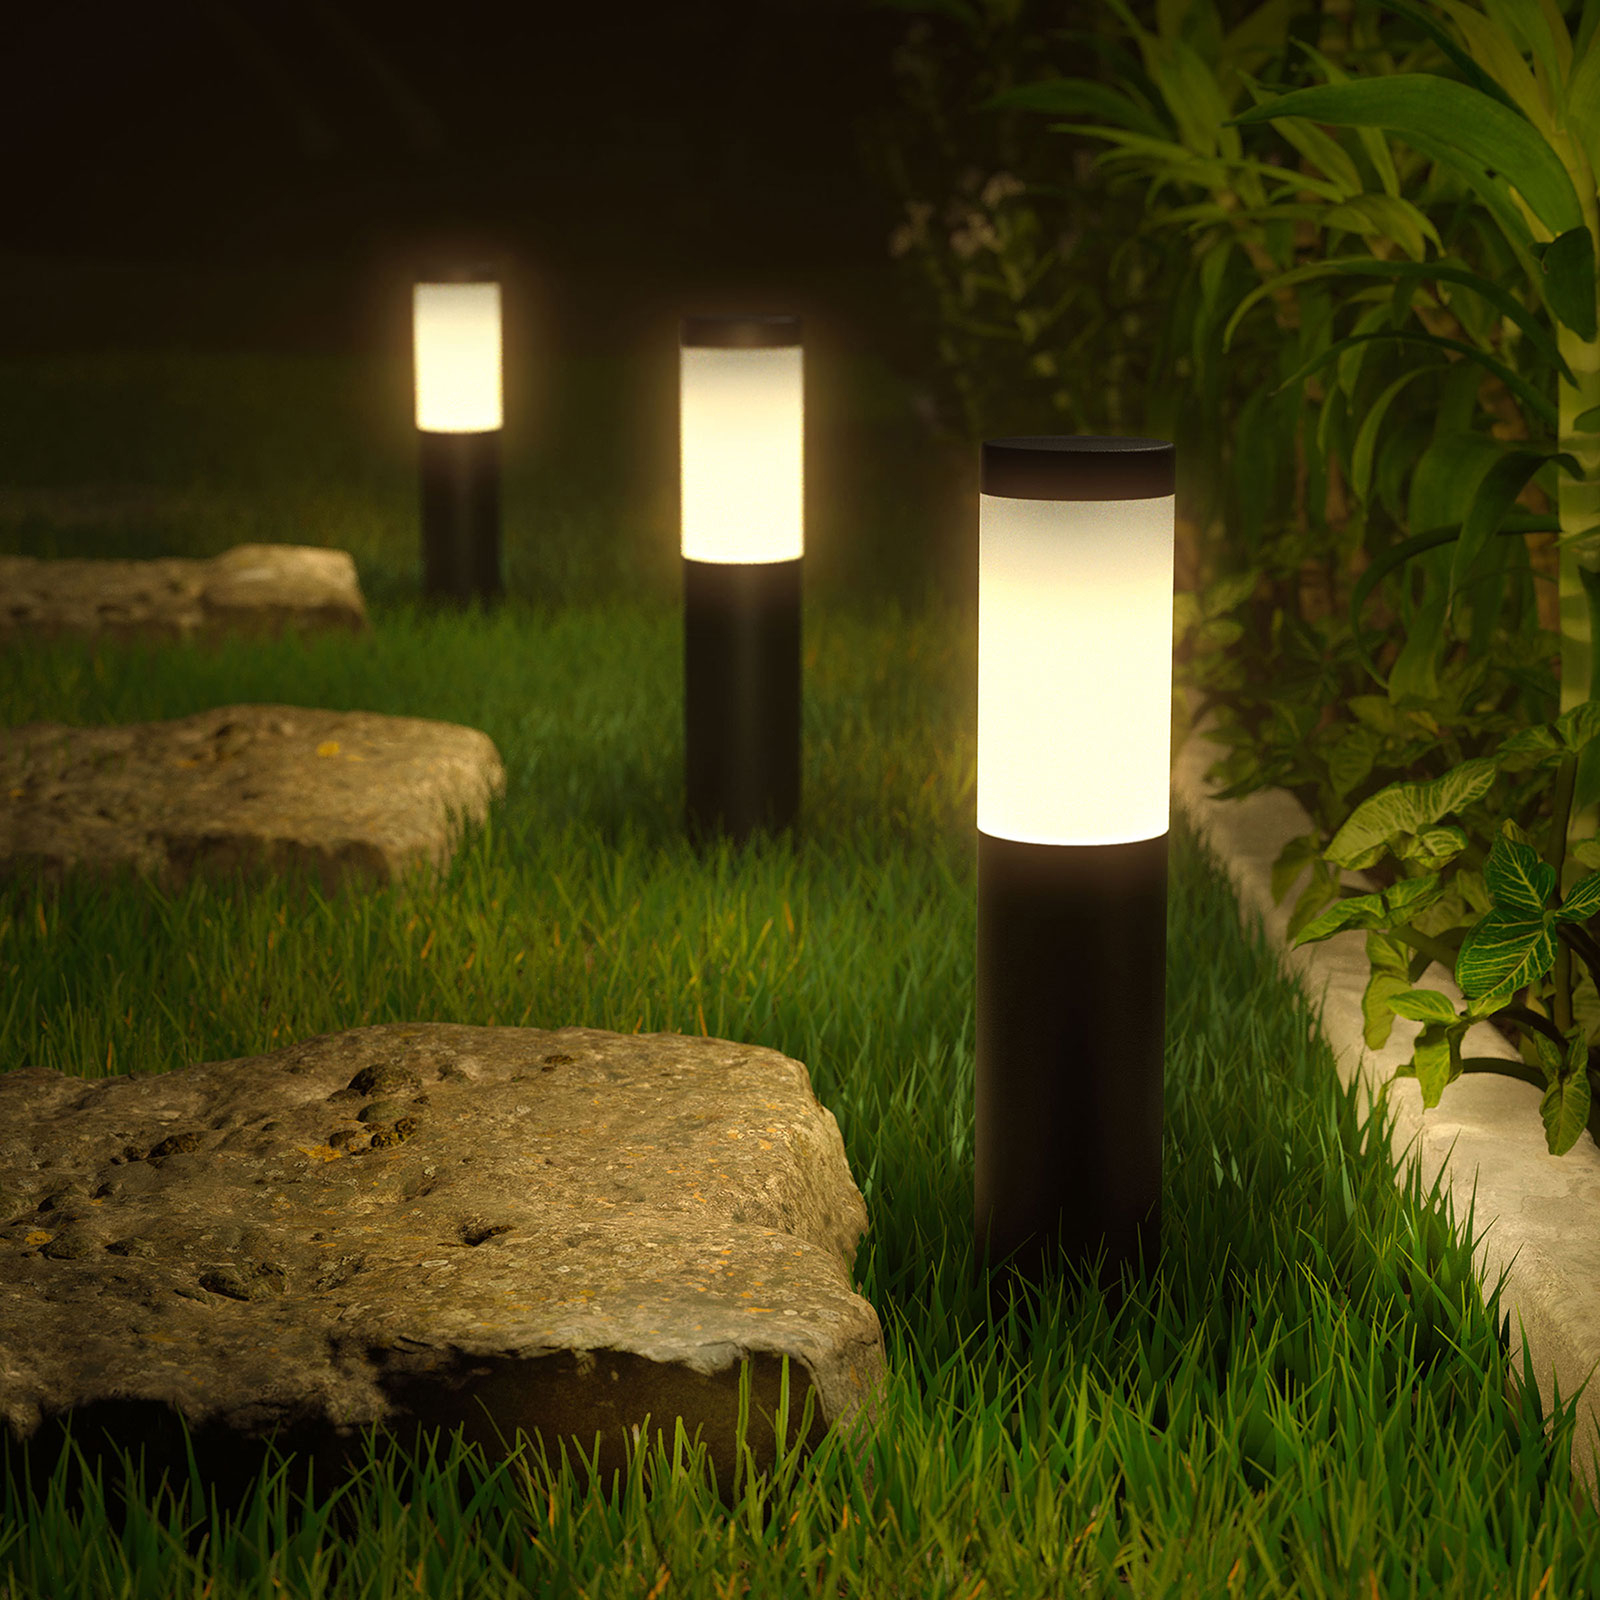 Innr LED-markspettslampa Smart Outdoor RGBW 3-pack